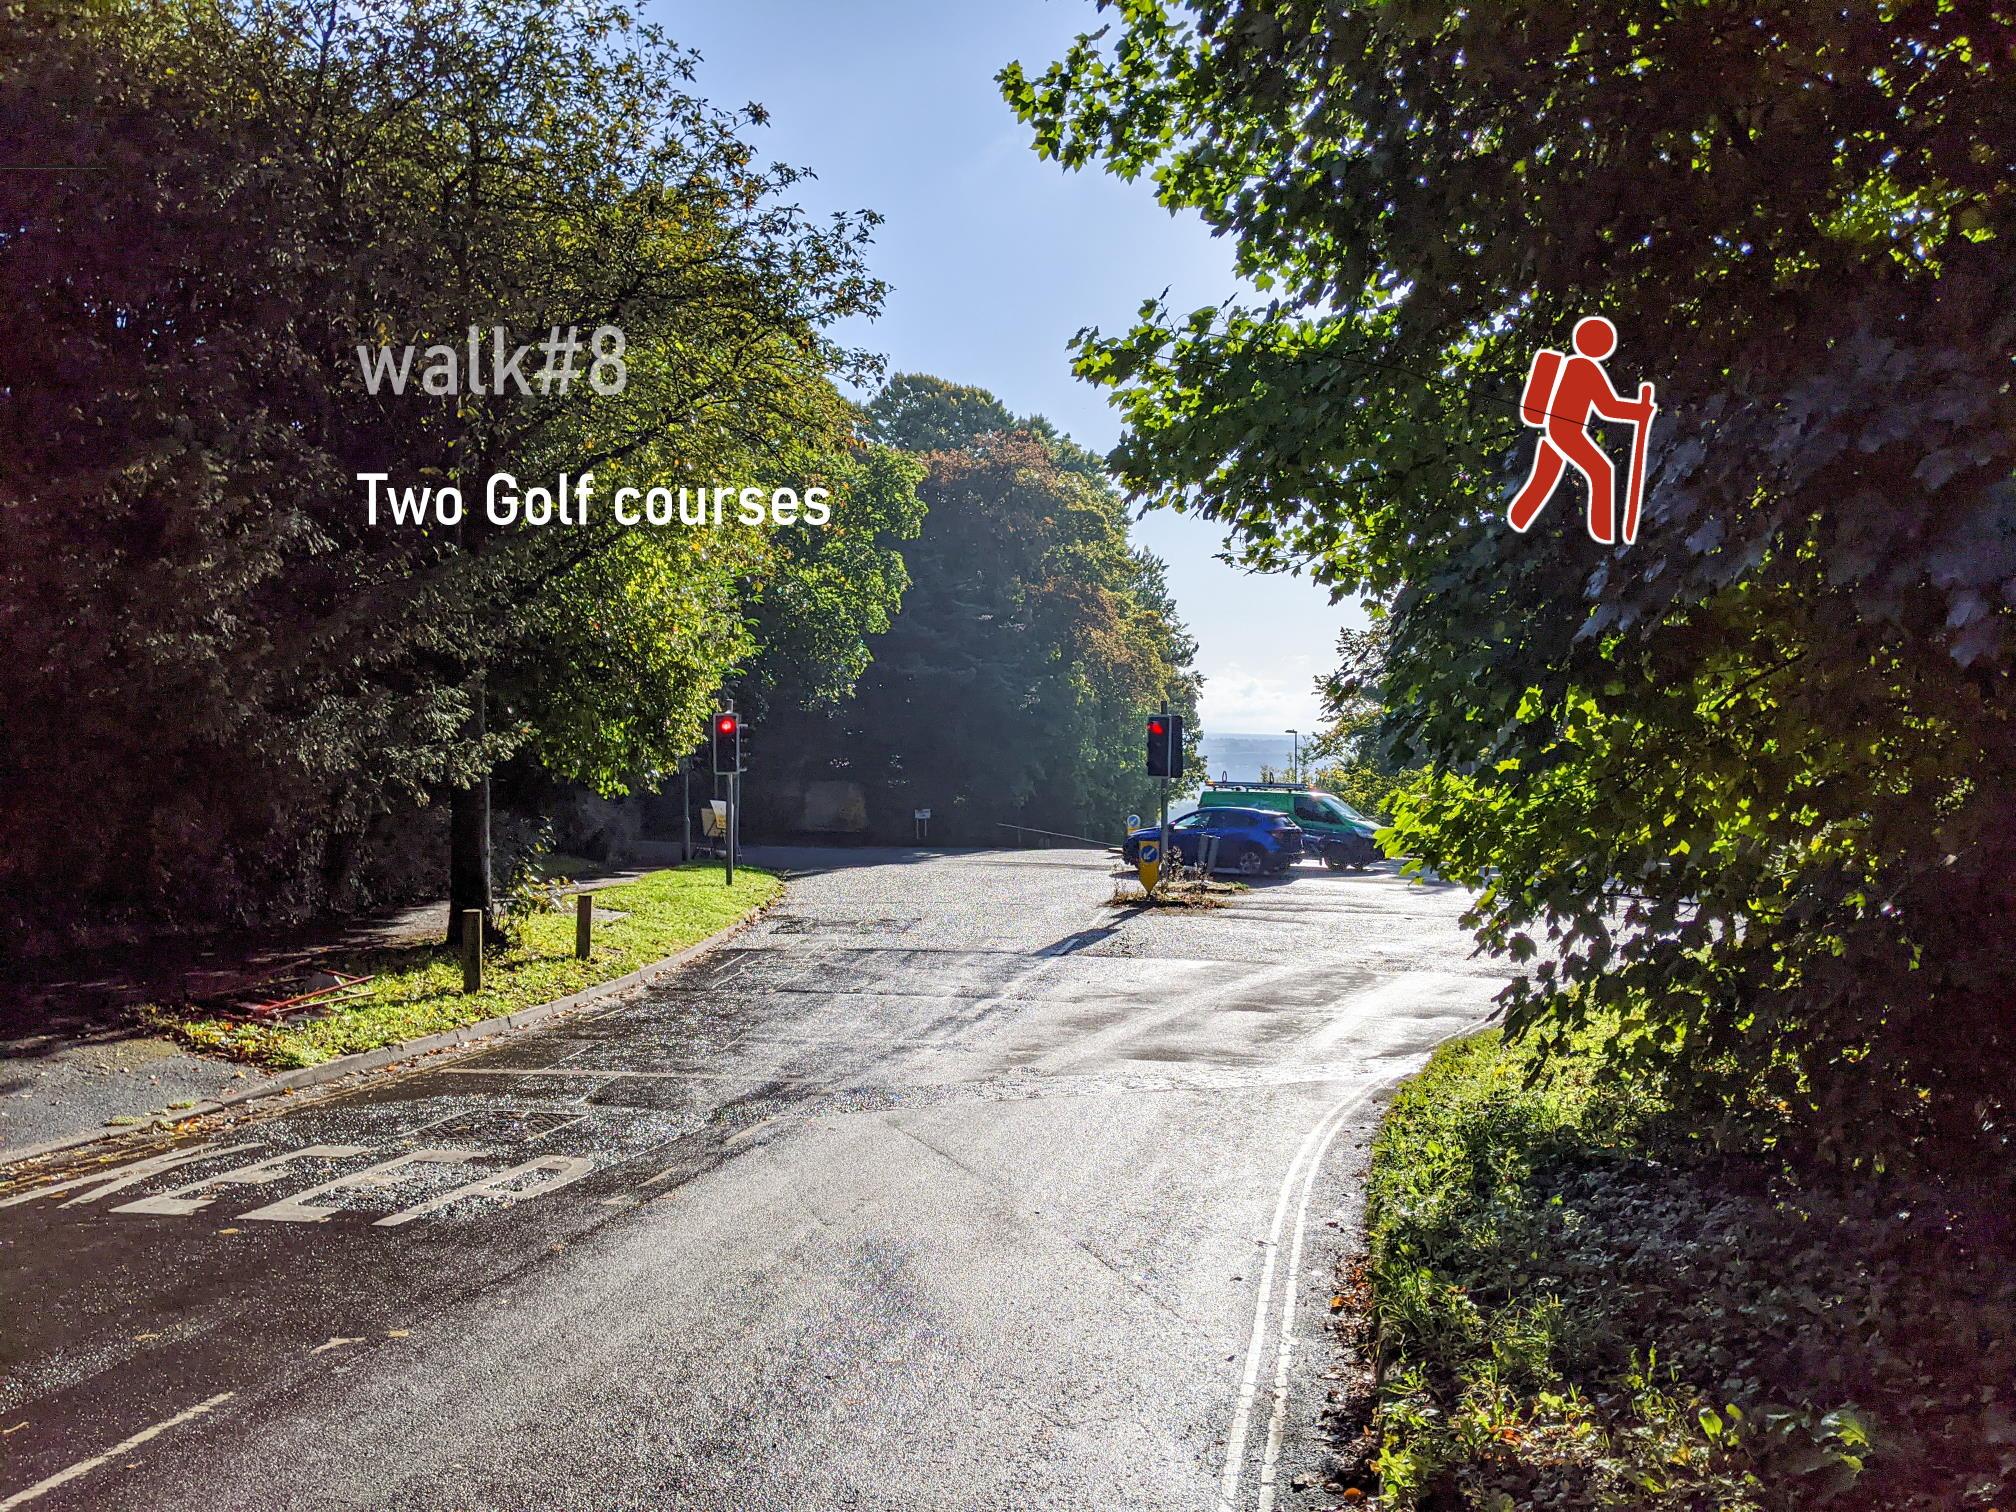 walk 8 - Golf courses